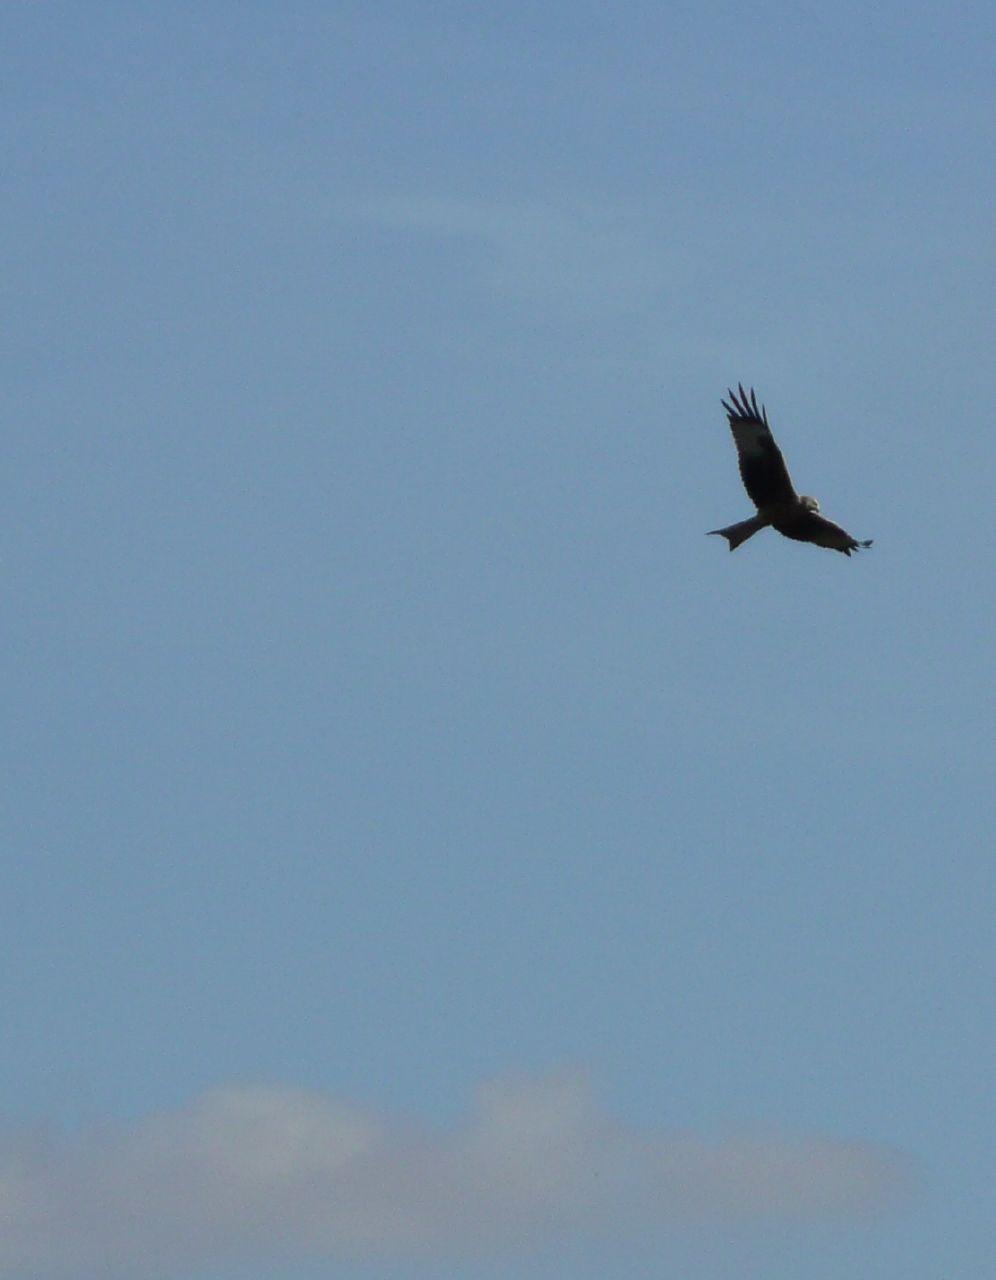 Book 1, Walk 9, Shiplake to Henley Kite, near Cowfields Farm, 20 October '07.